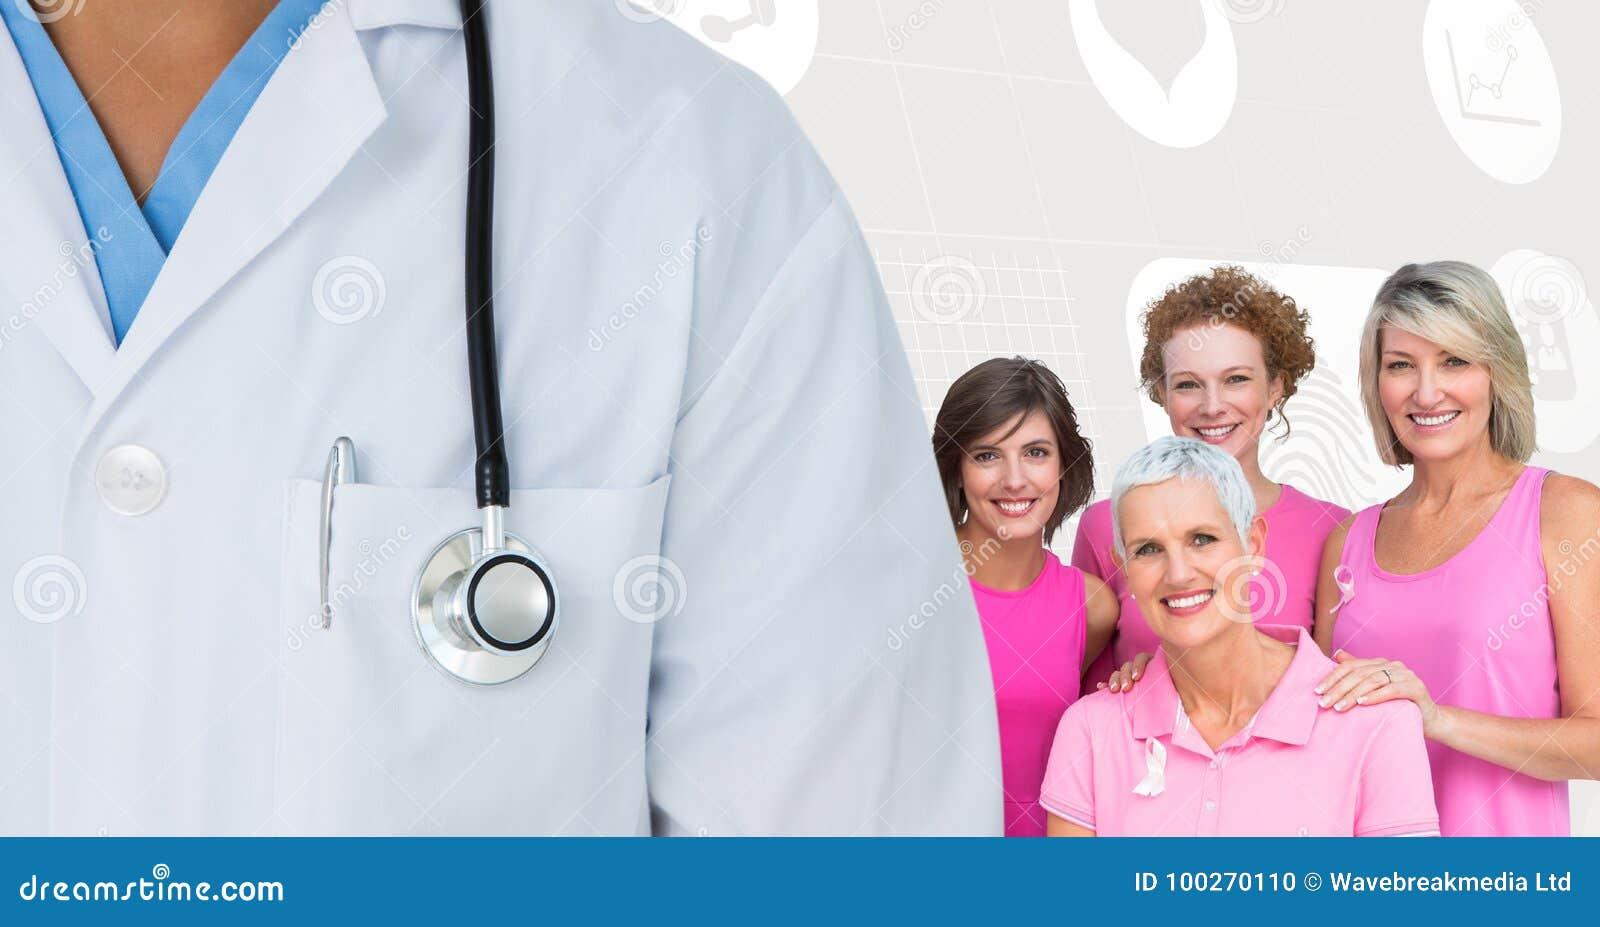 Brustkrebsdoktor und -frauen mit rosa Bewusstseinsbändern